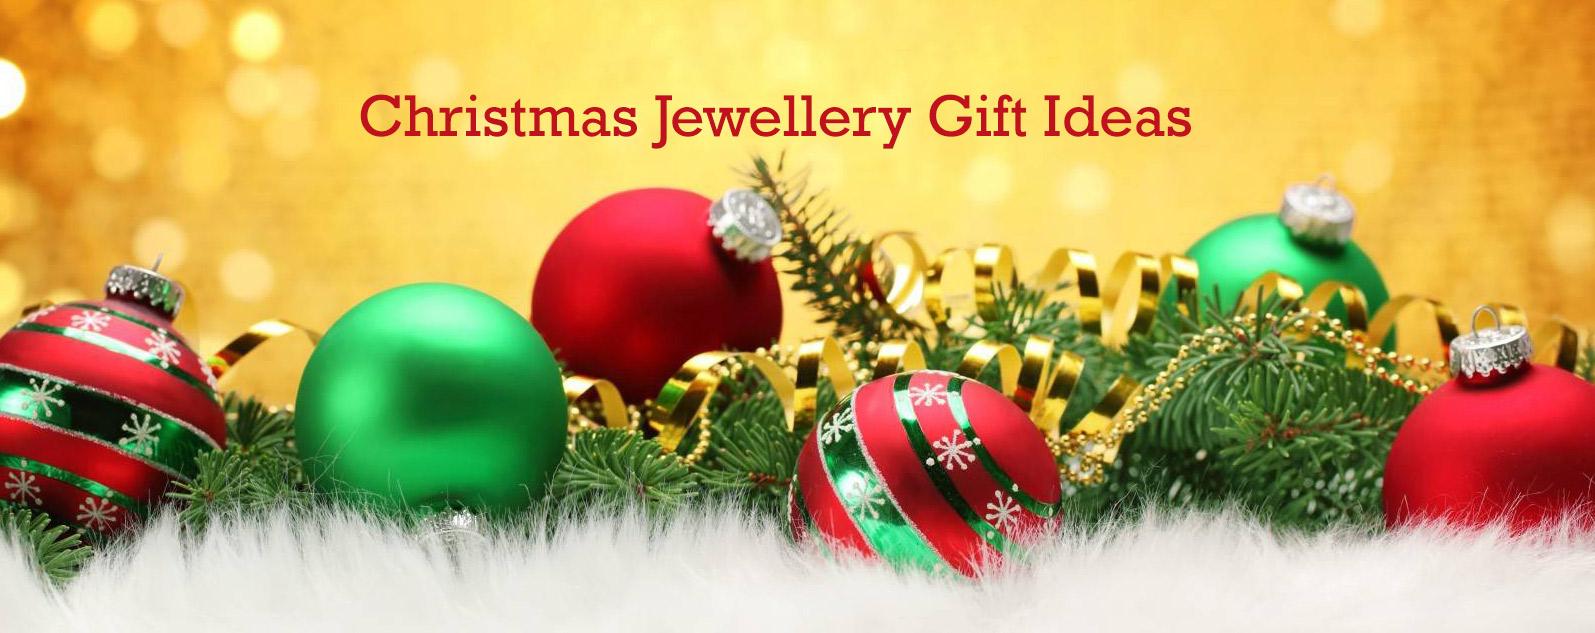 Christmas Jewellery Ideas